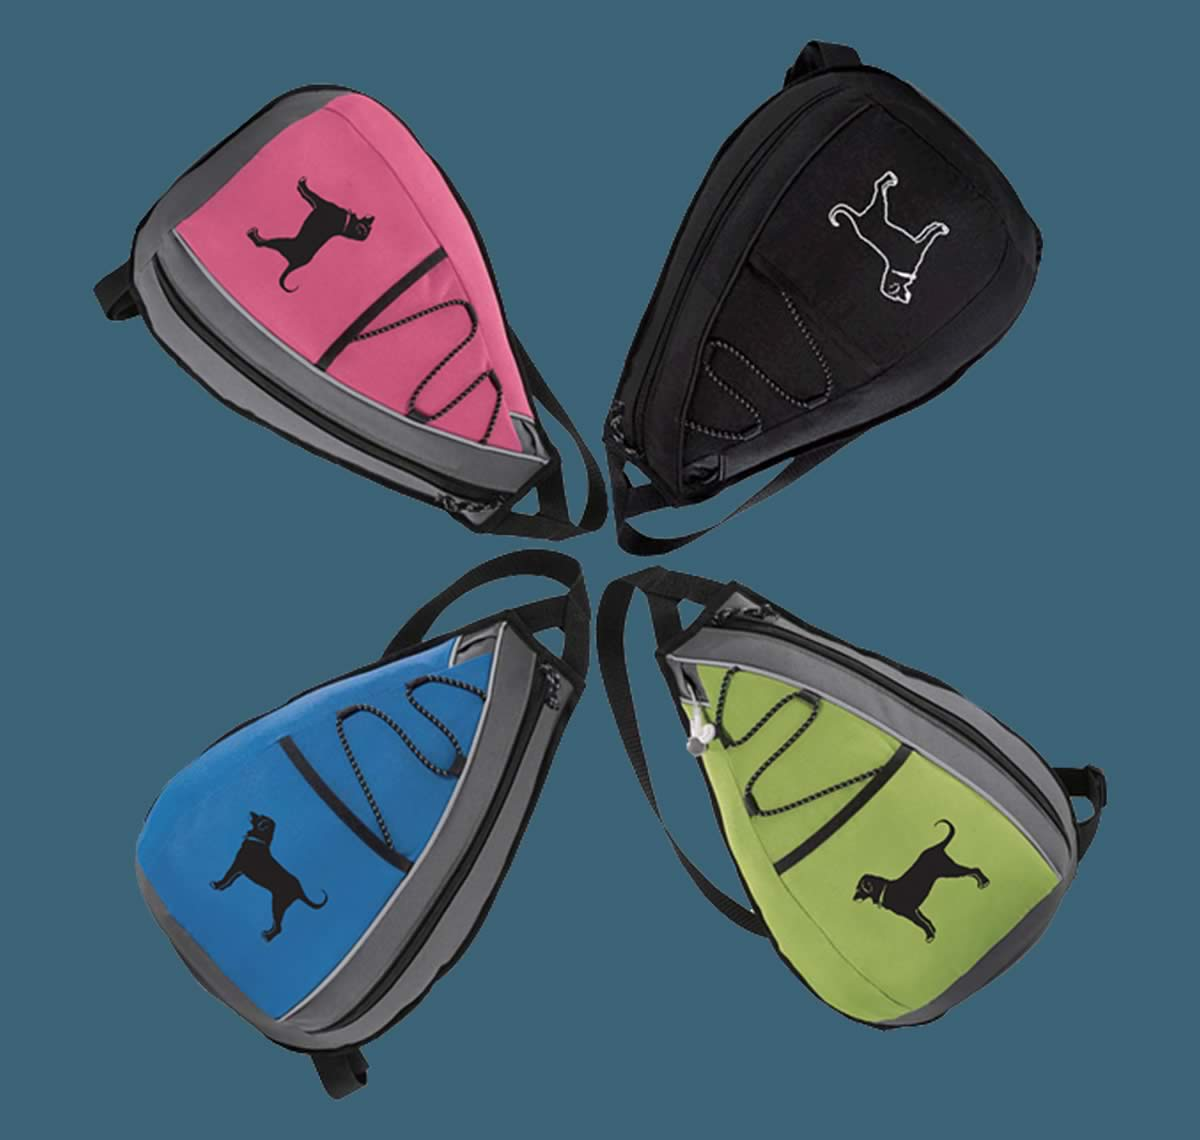 The Black Dog sling bags